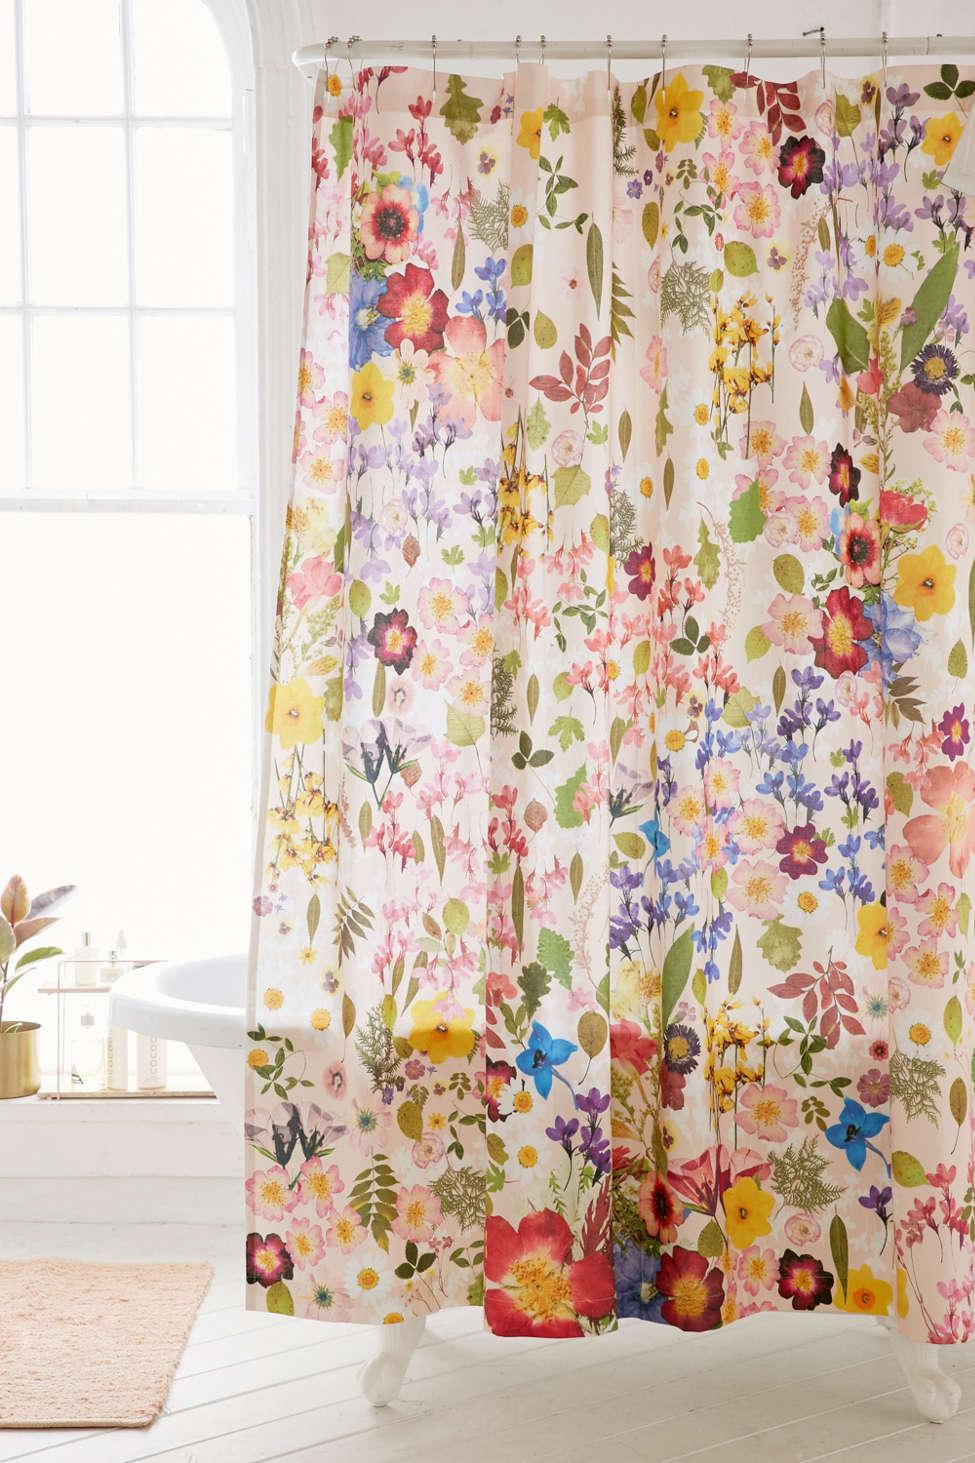 Slide View: 1: Pressed Flower Shower Curtain